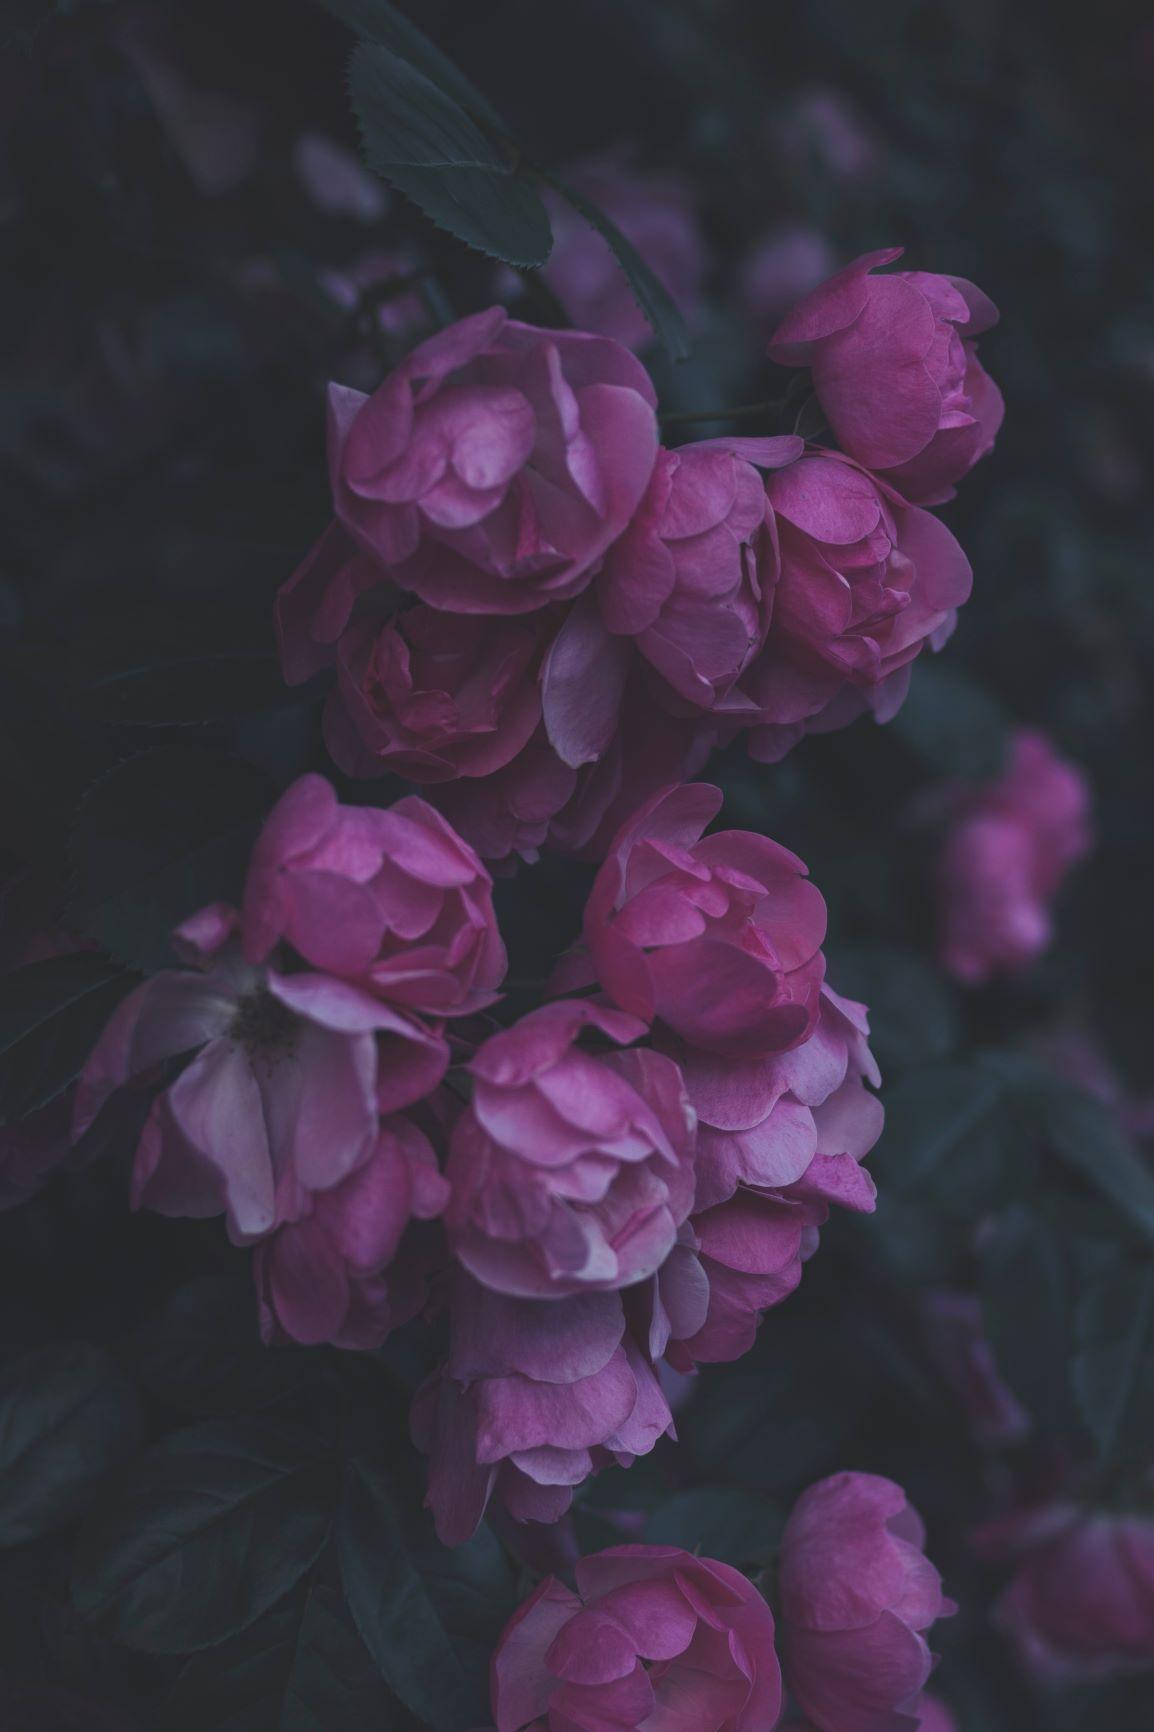 roses tomoko-uji-y4soWxEkEEU-unsplash